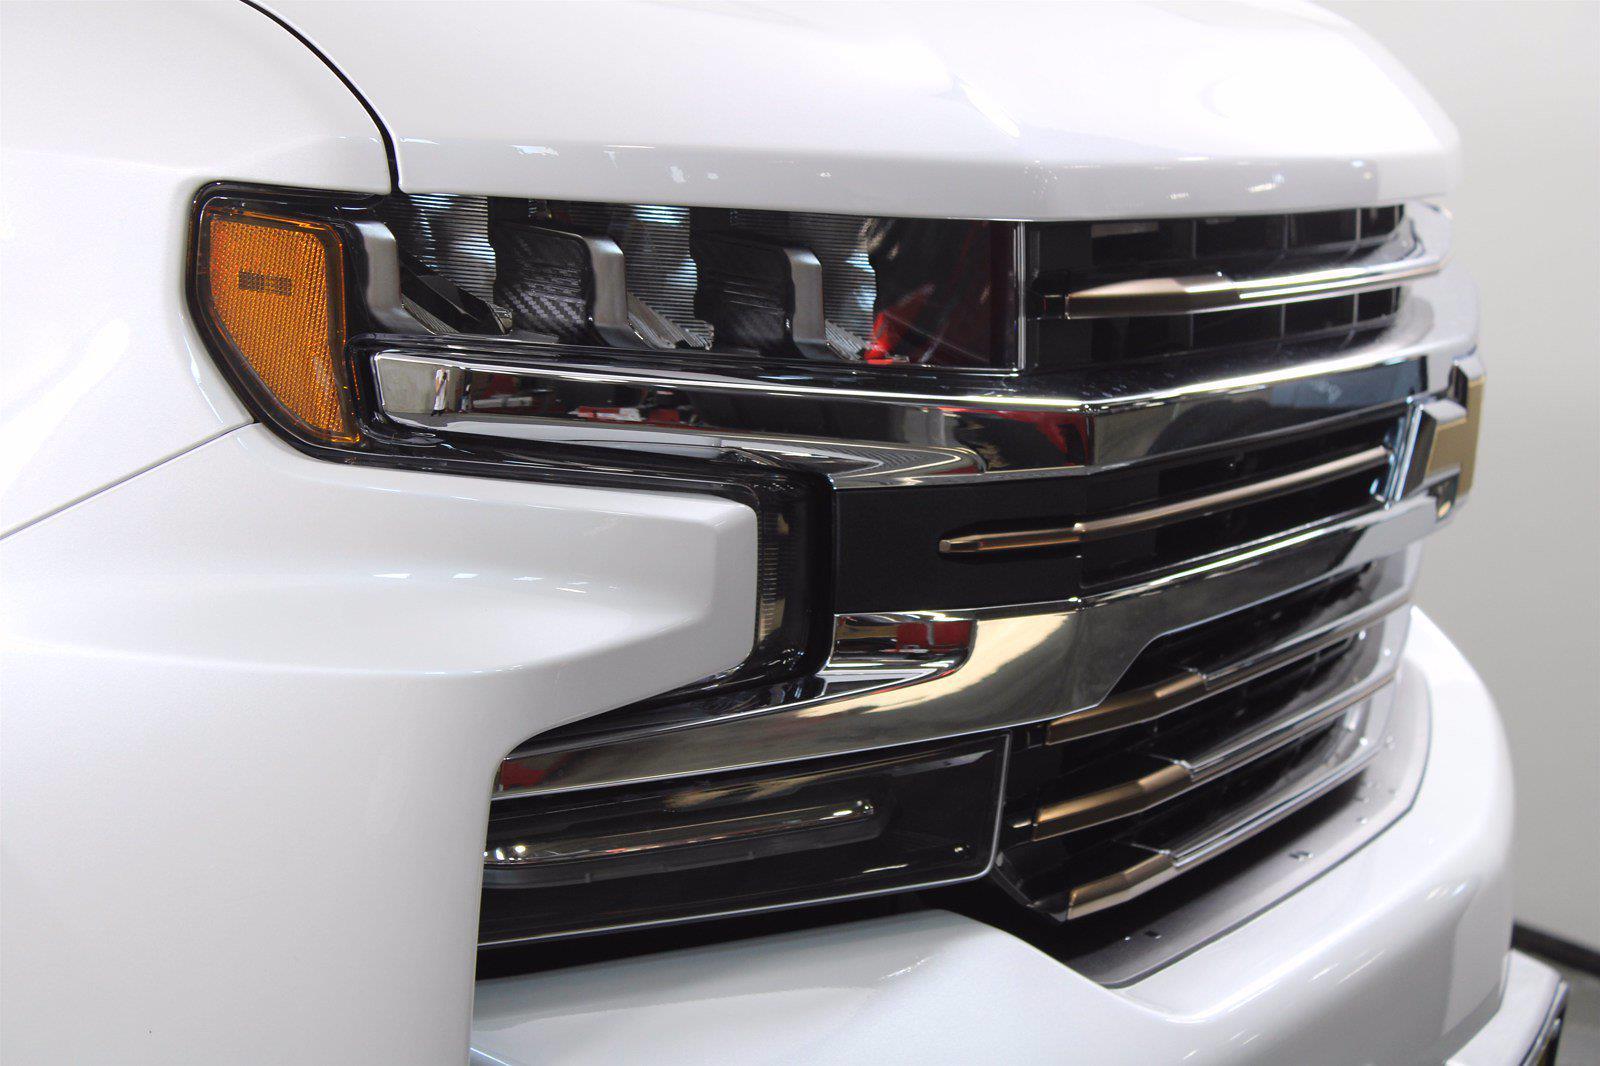 2021 Chevrolet Silverado 1500 Crew Cab 4x4, Pickup #D111069 - photo 5